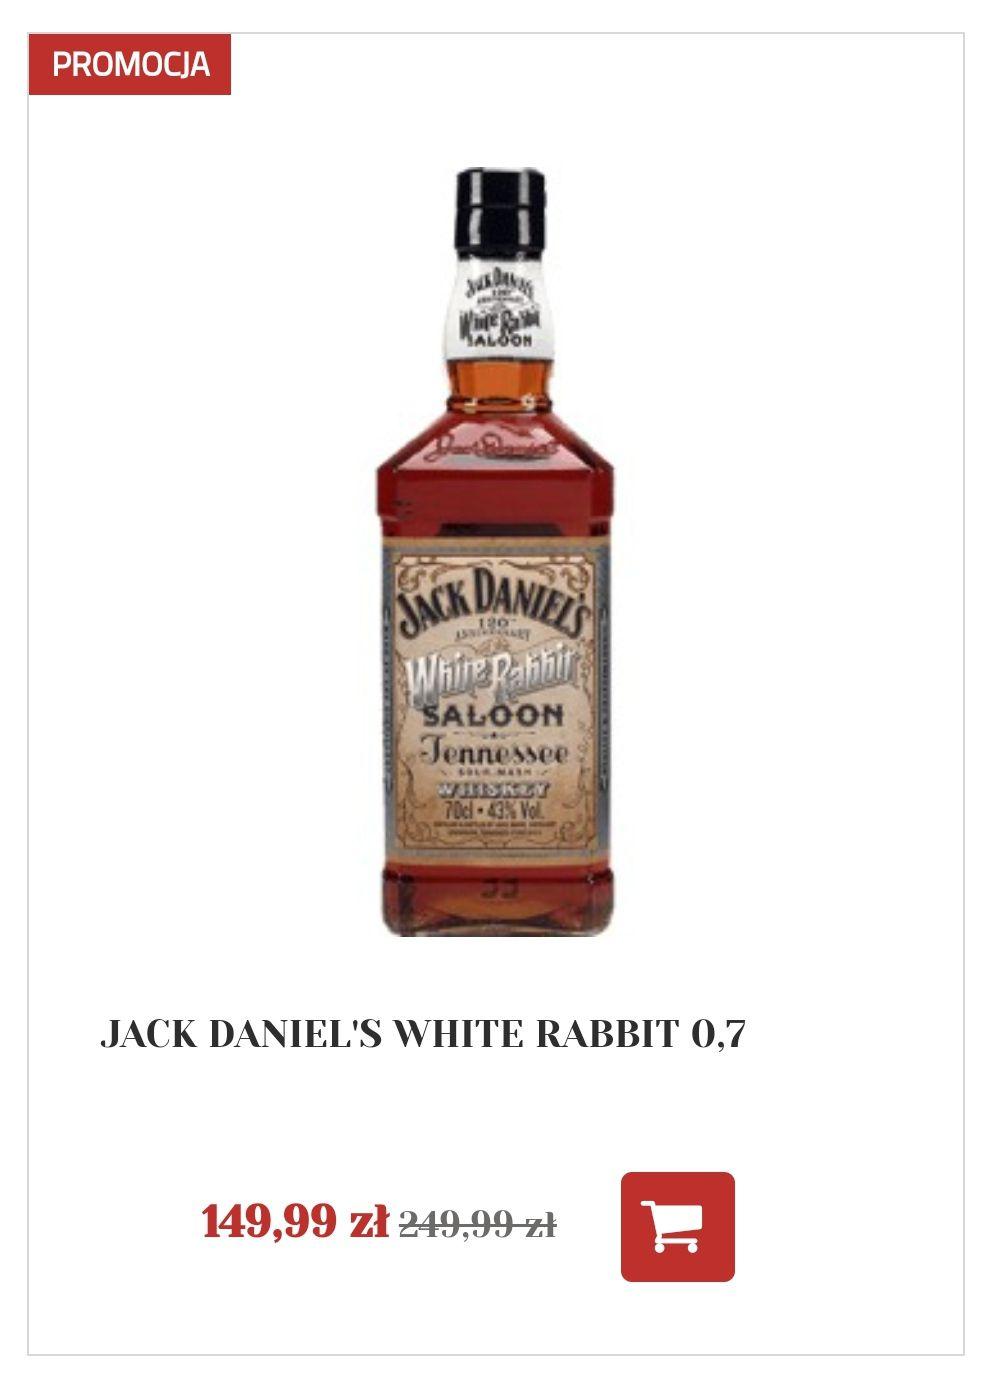 Jack DANIEL'S White Rabbit promocja alkooutlet